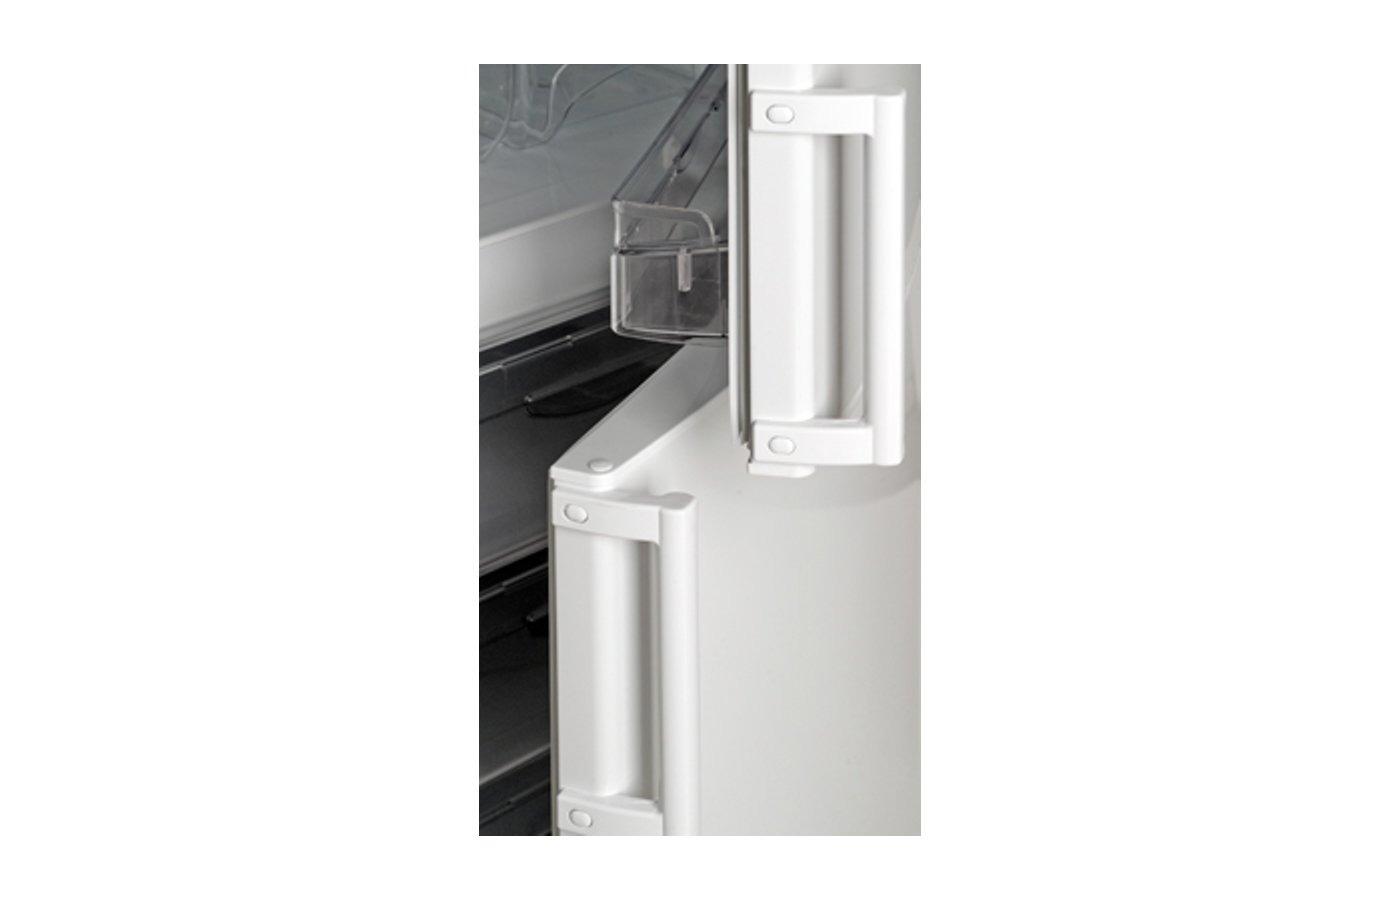 Холодильник Atlant ХМ 4025-000, двухкамерный, белый Atlant